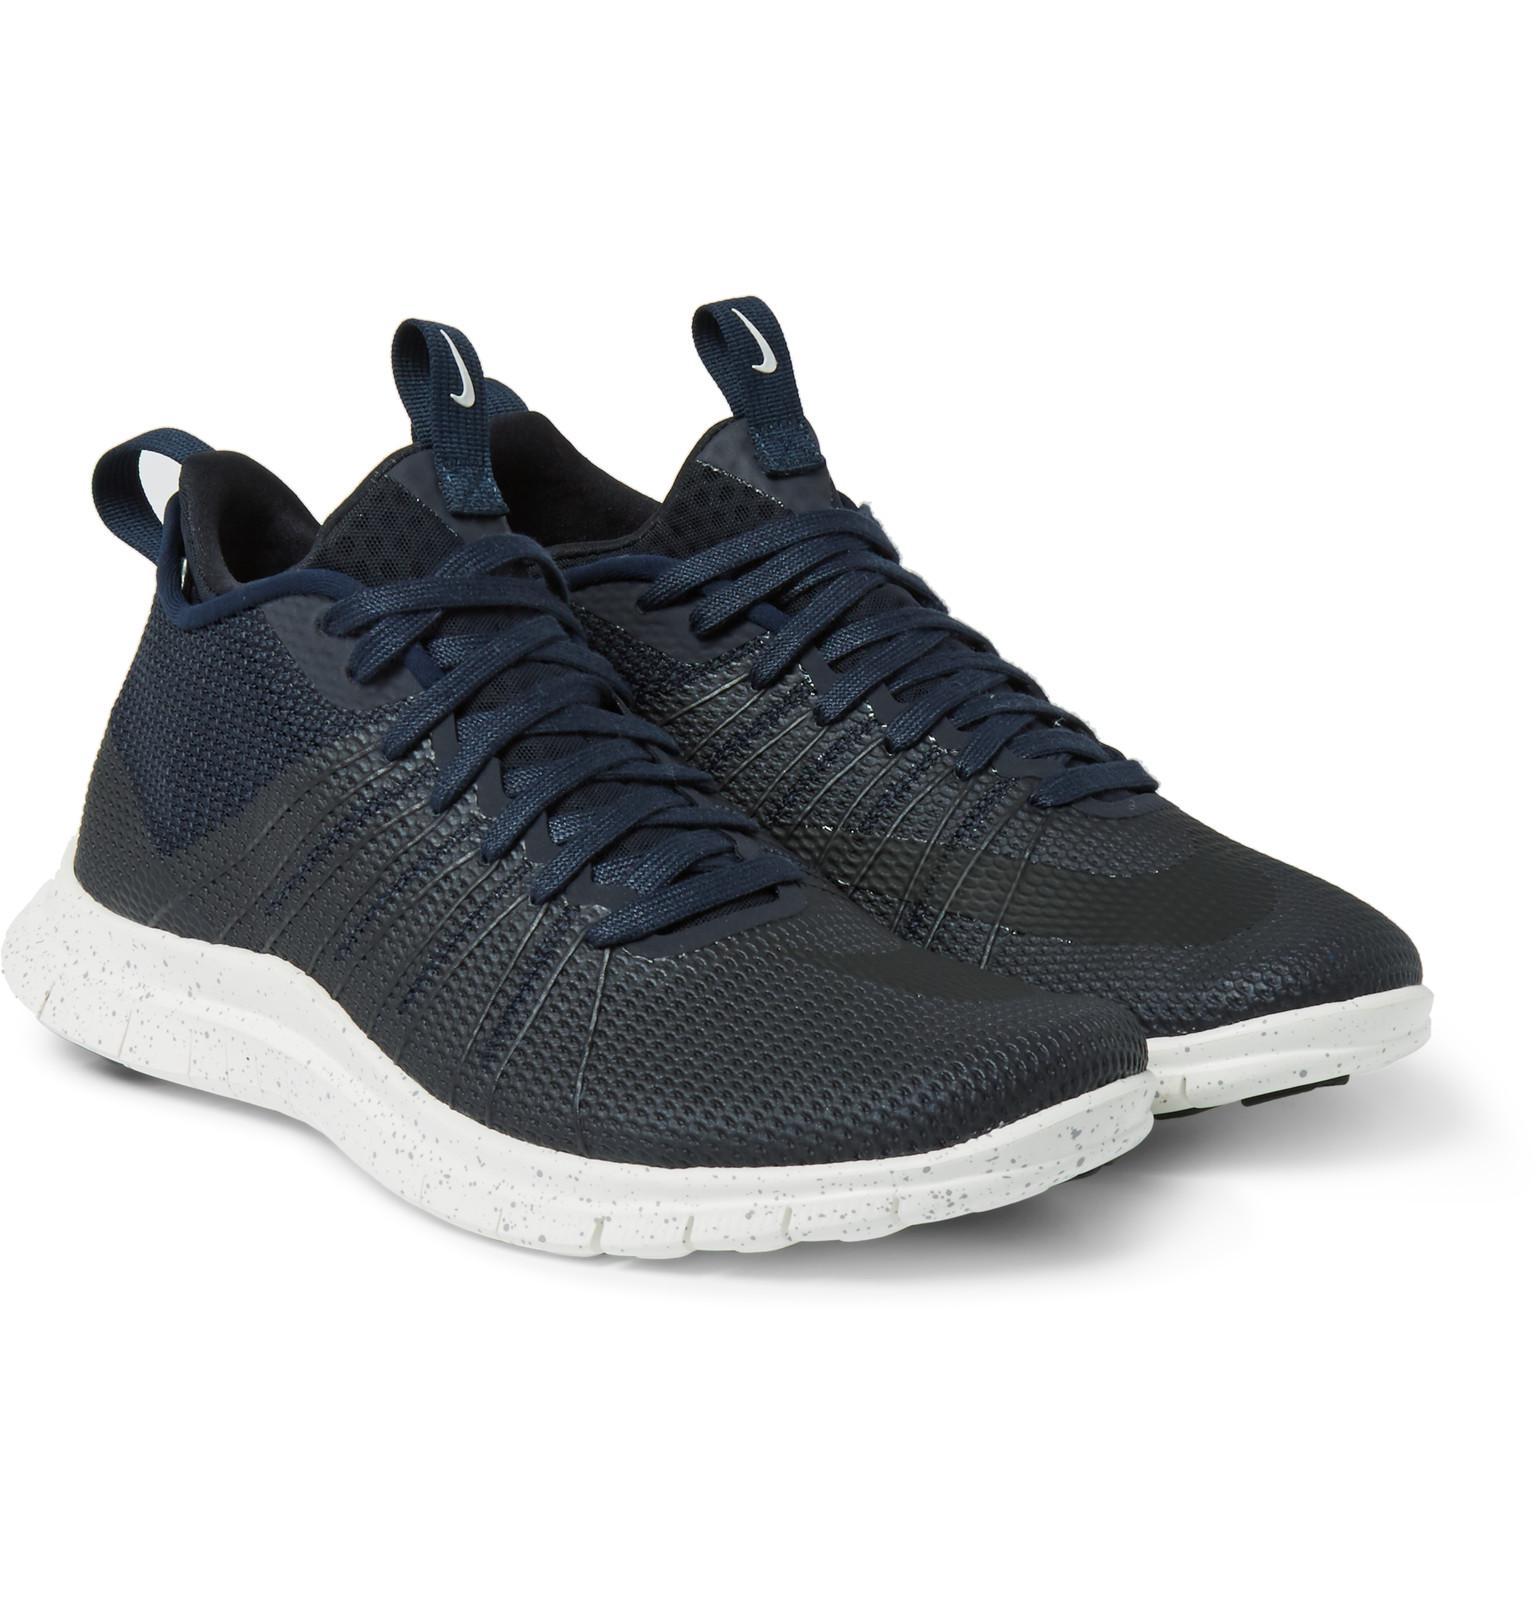 huge selection of b886f 10805 Lyst - Nike Free Hypervenom 2 Fs Coated Mesh Sneakers in Black for Men